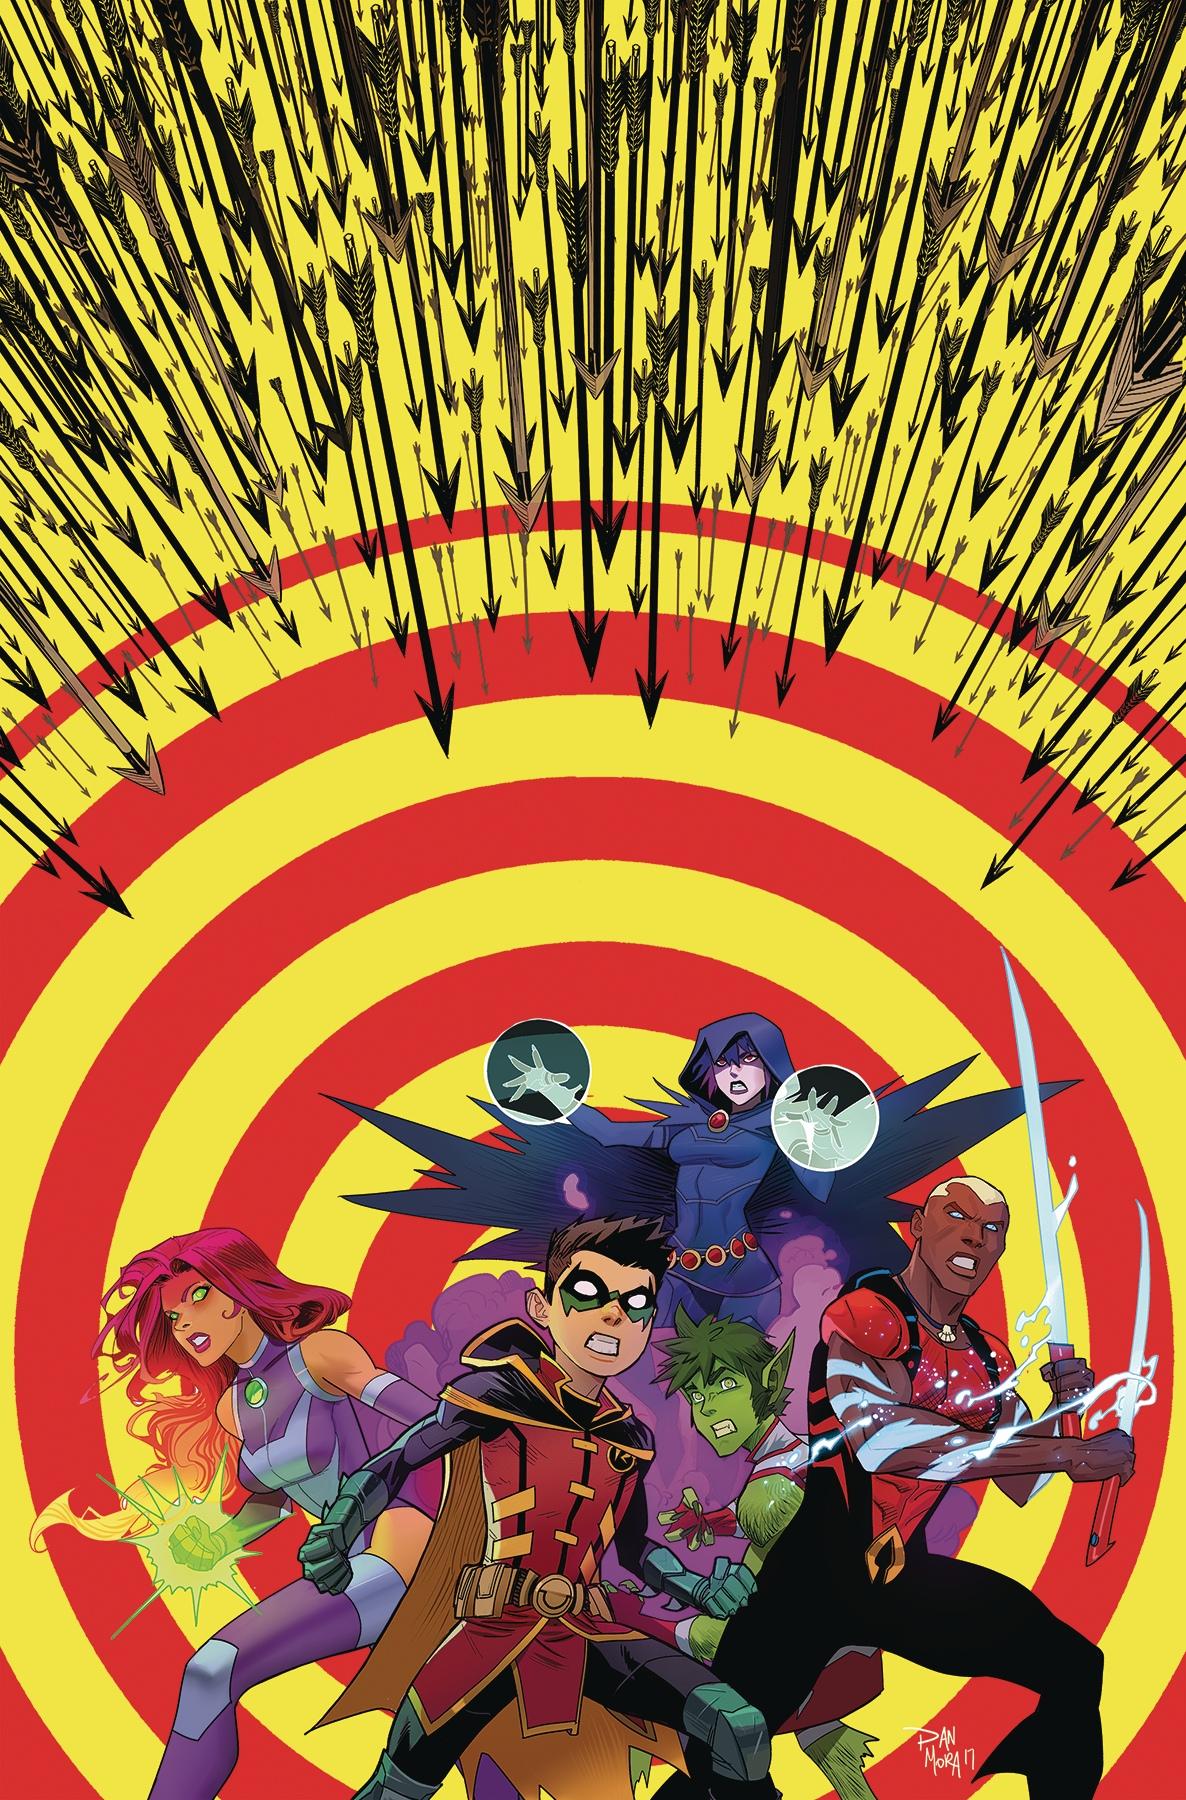 Teen Titans Vol 6 13 Textless.jpg